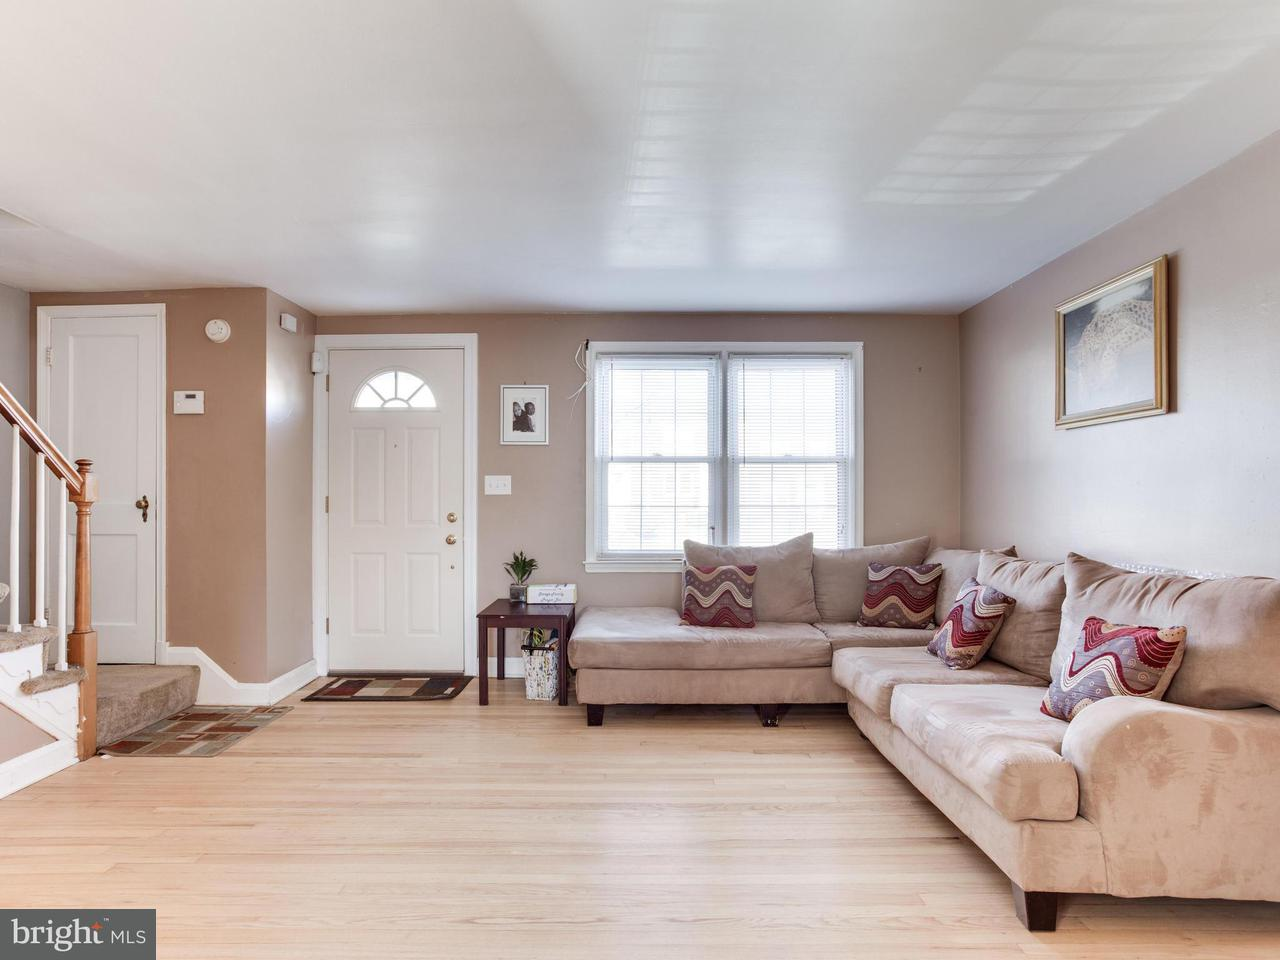 Single Family for Sale at 1619 Kirkwood Rd Gwynn Oak, Maryland 21207 United States